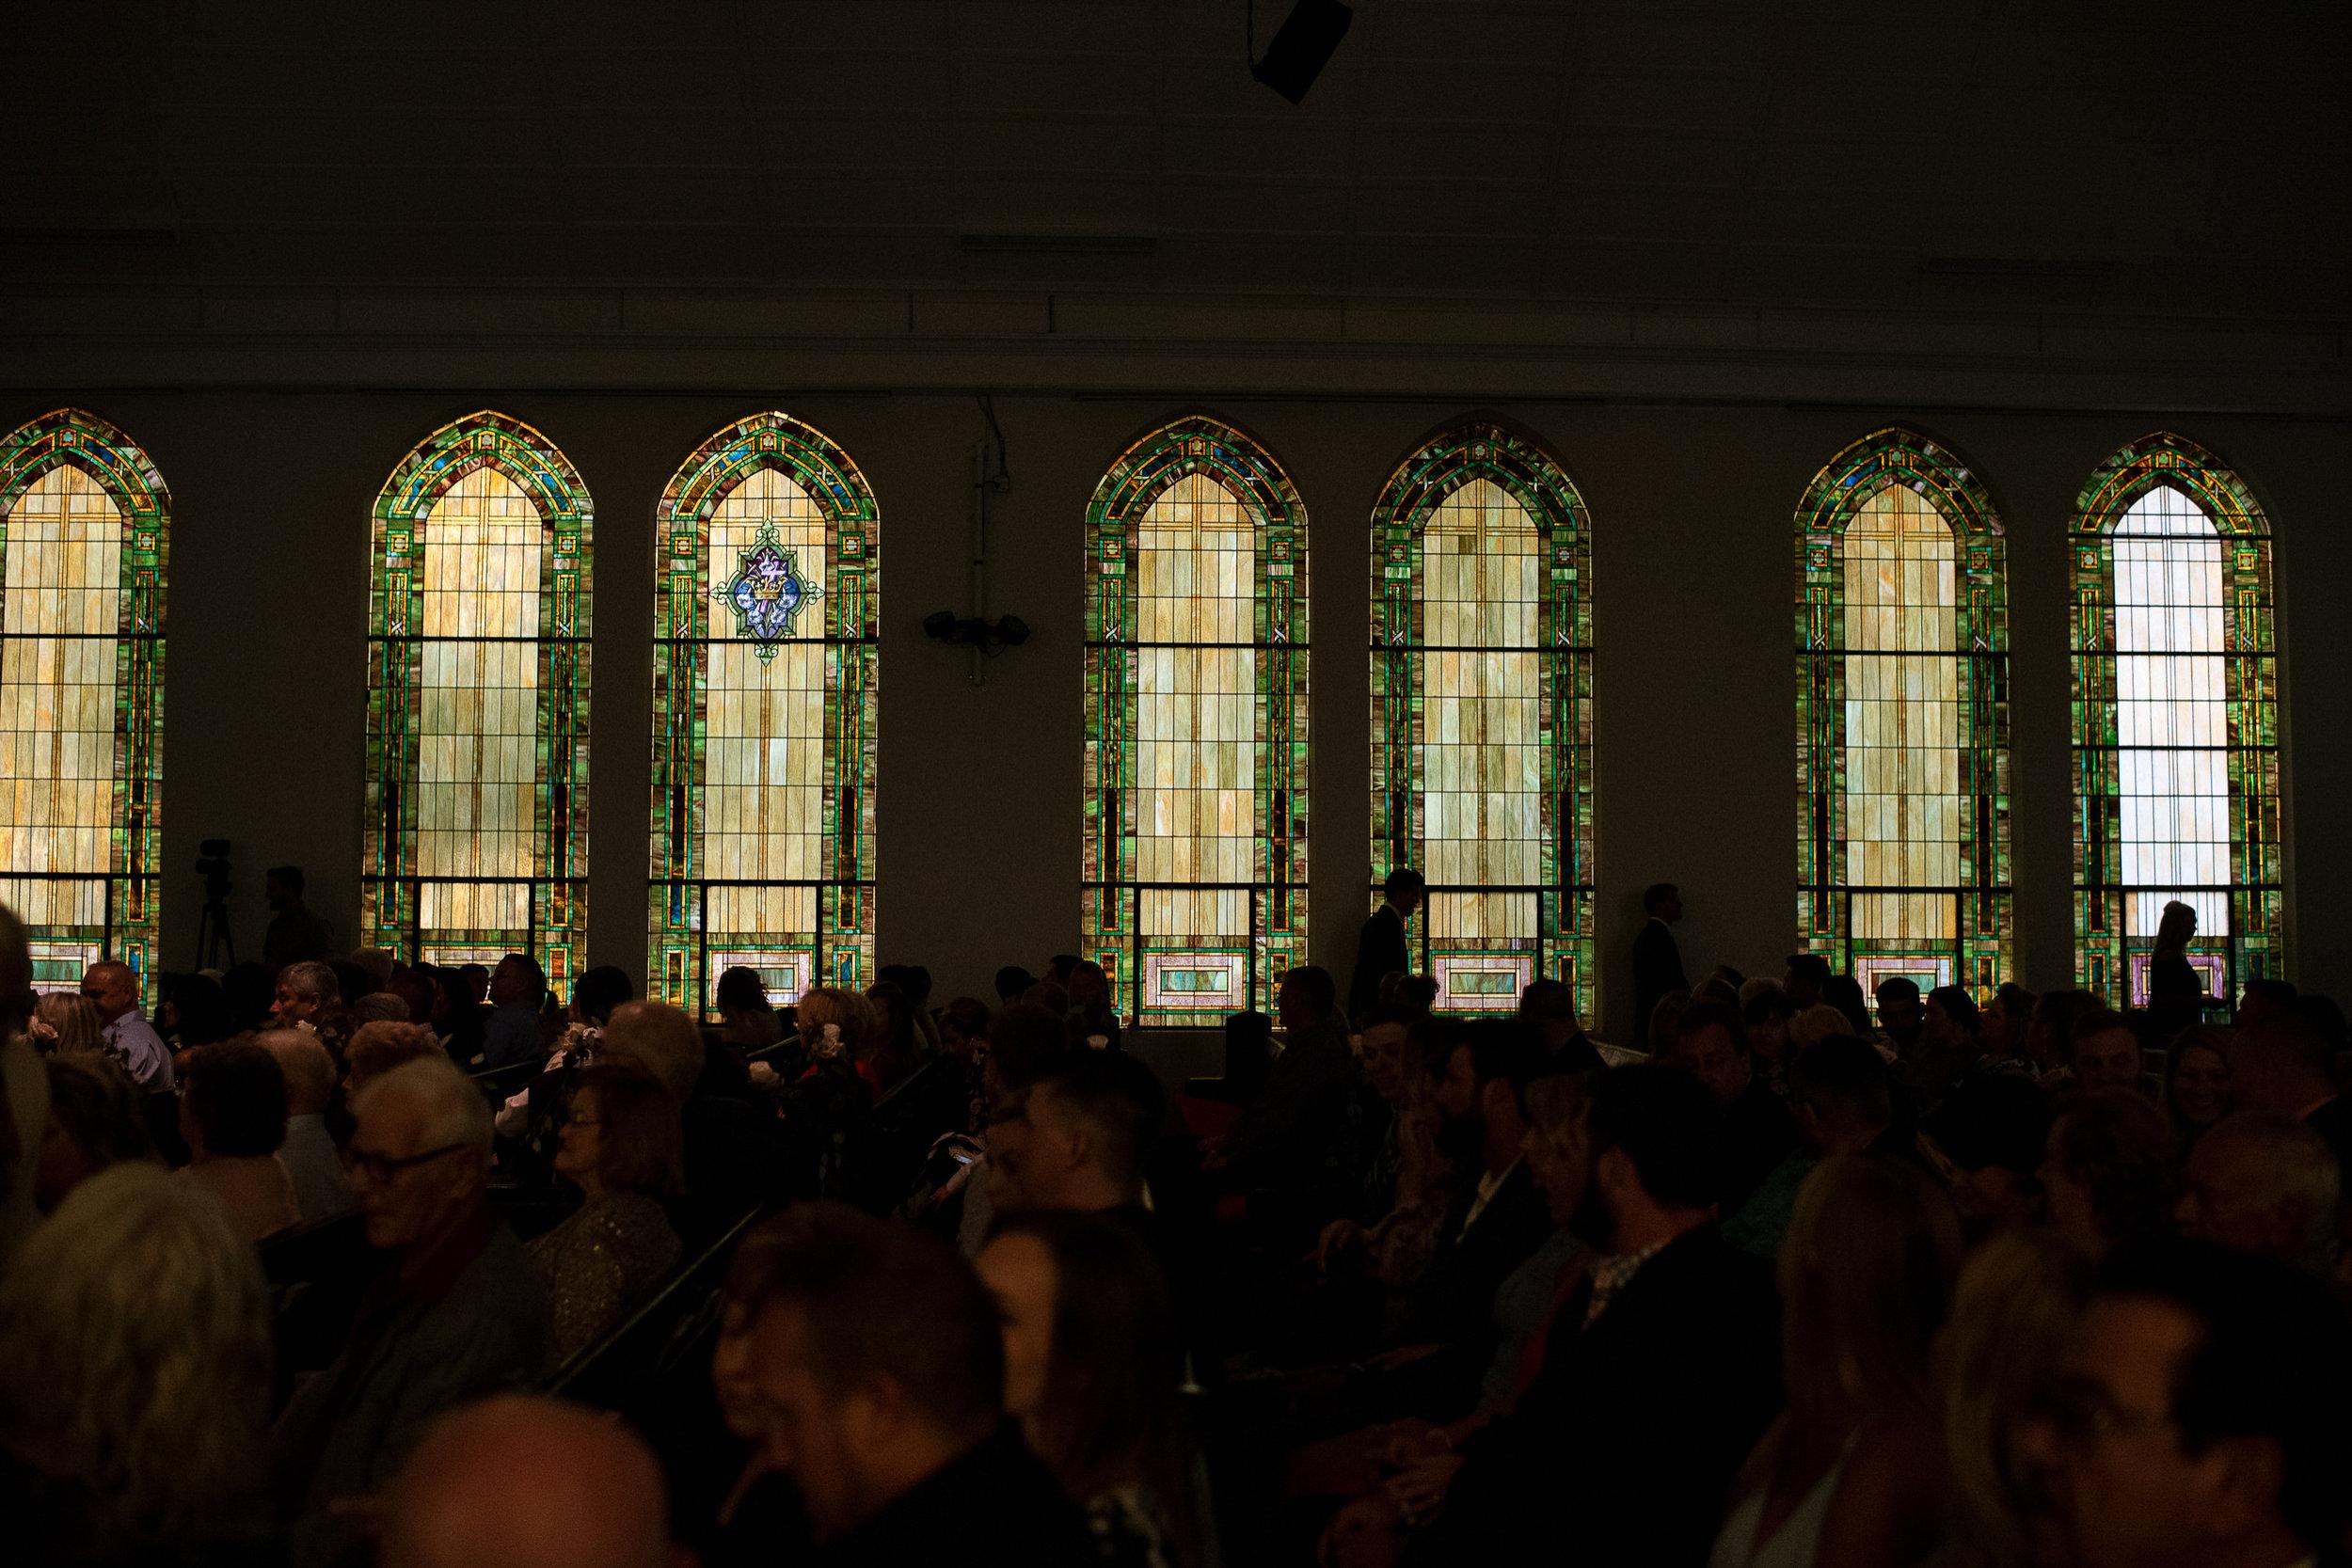 Lakeland Wedding Grace City Church and Haus 820 by Sunglow Photo